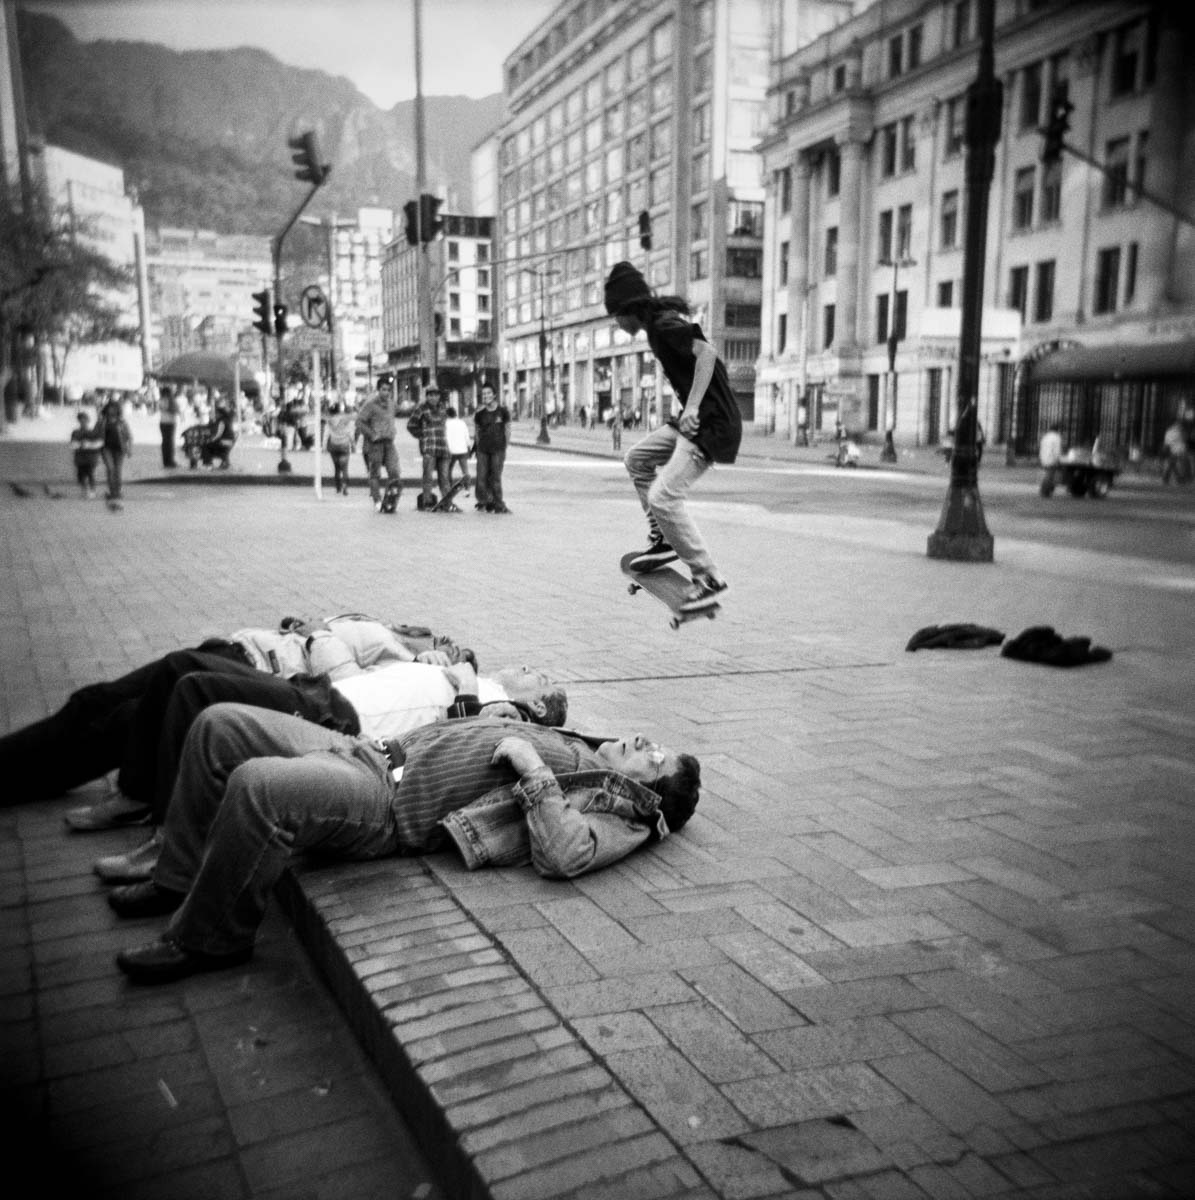 Gloomy_Bogota_06